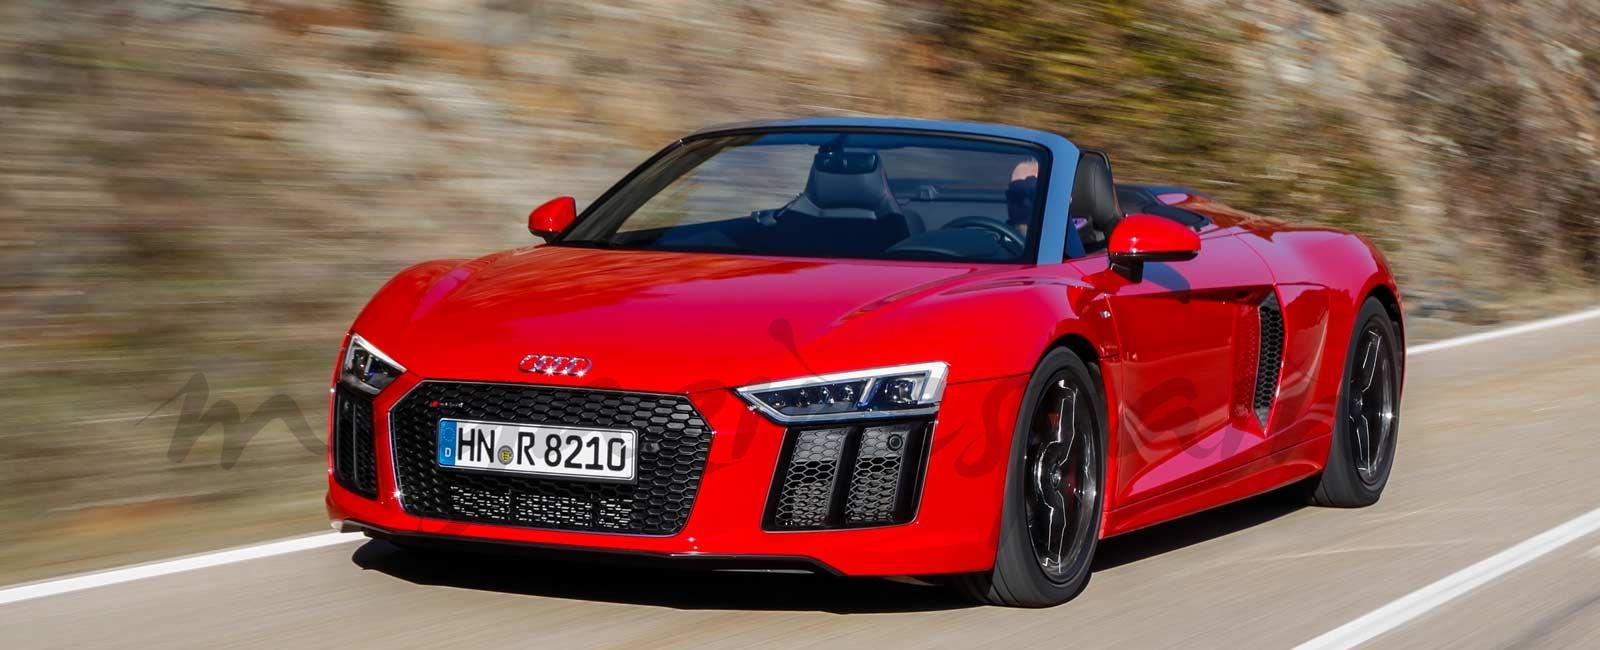 El nuevo Audi R8 V10 RWS